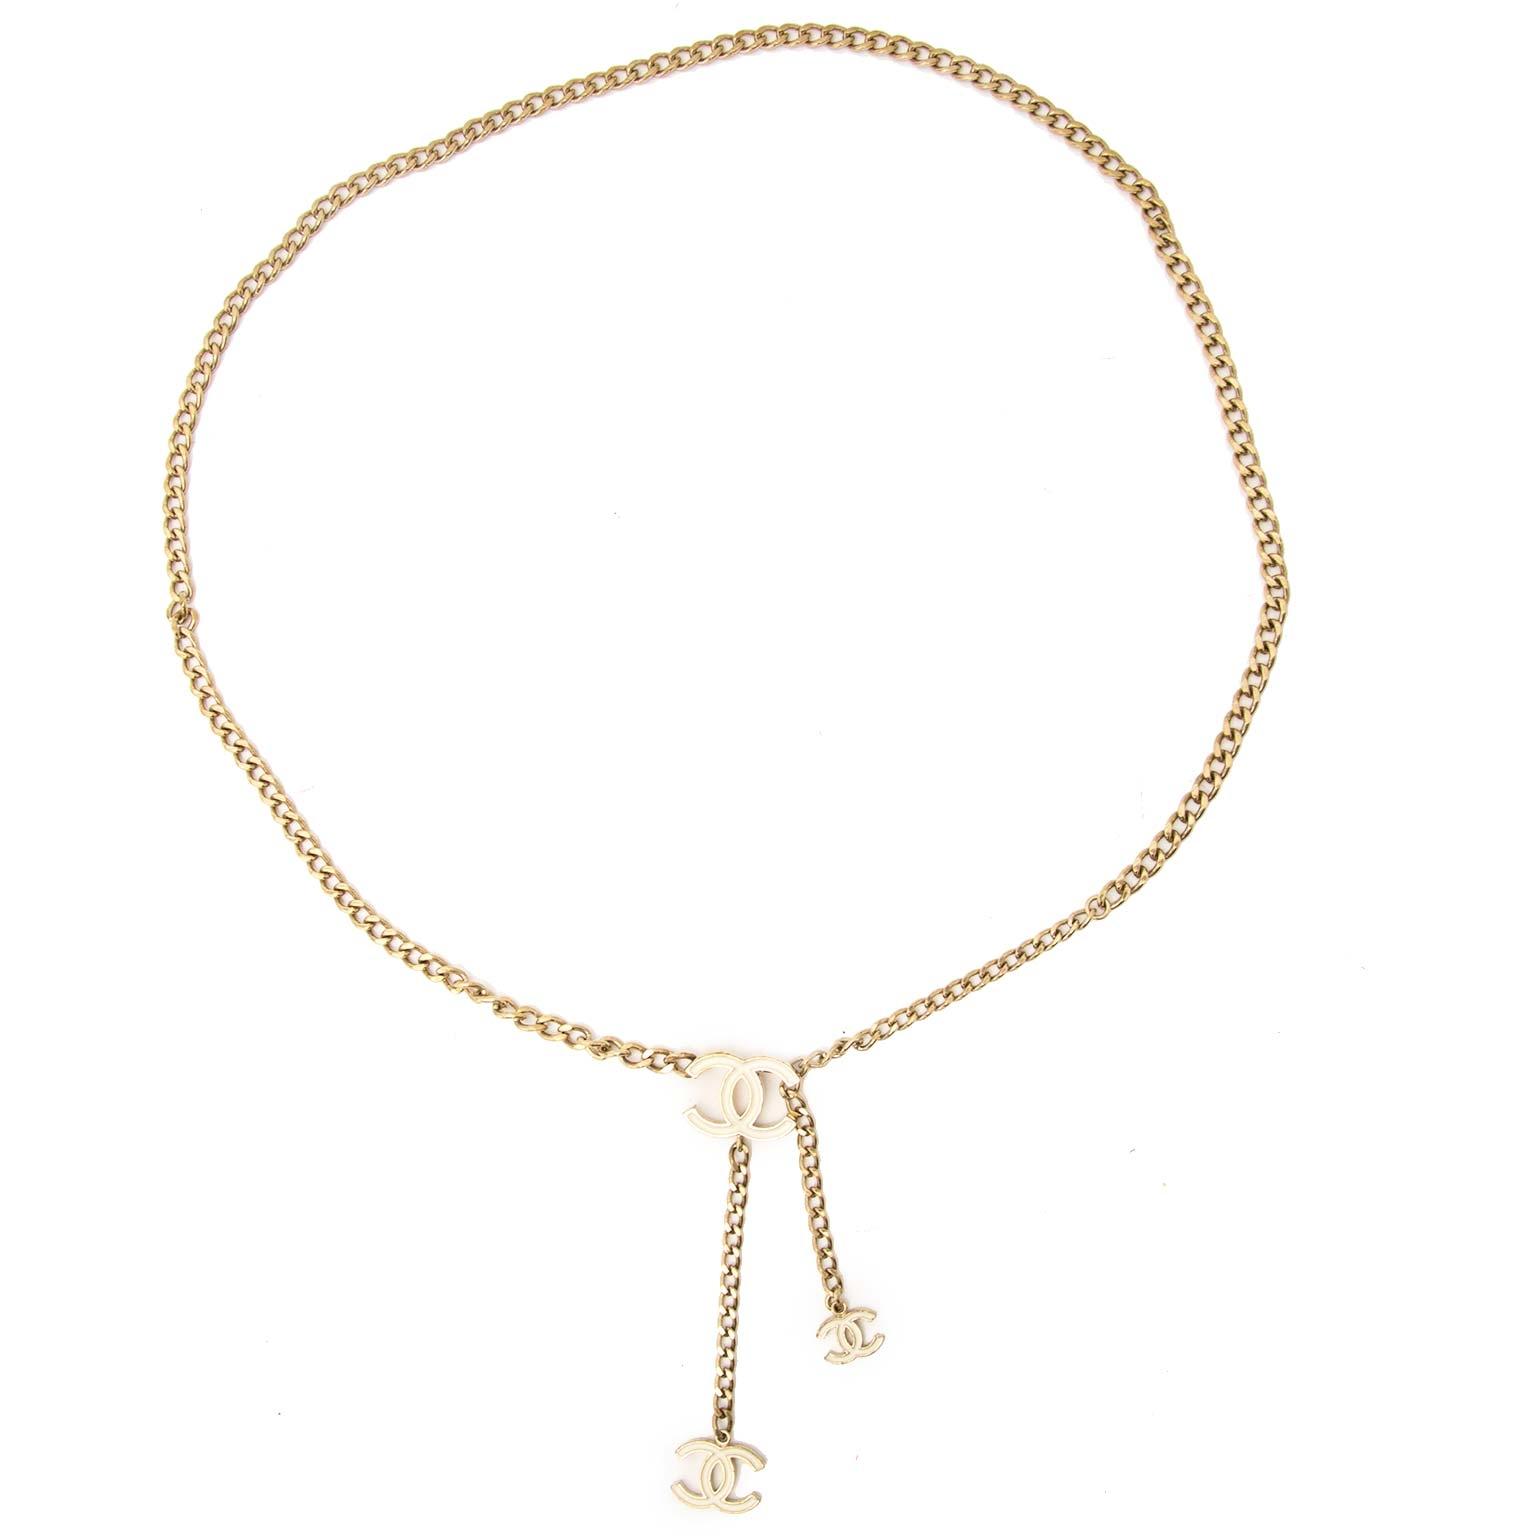 Chanel Vintage Gold-Toned Chain Jewelry Belt Buy authentic designer Chanel secondhand belts at Labellov at the best price. Safe and secure shopping. Koop tweedehands authentieke Chanel riemen bij designer webwinkel labellov.